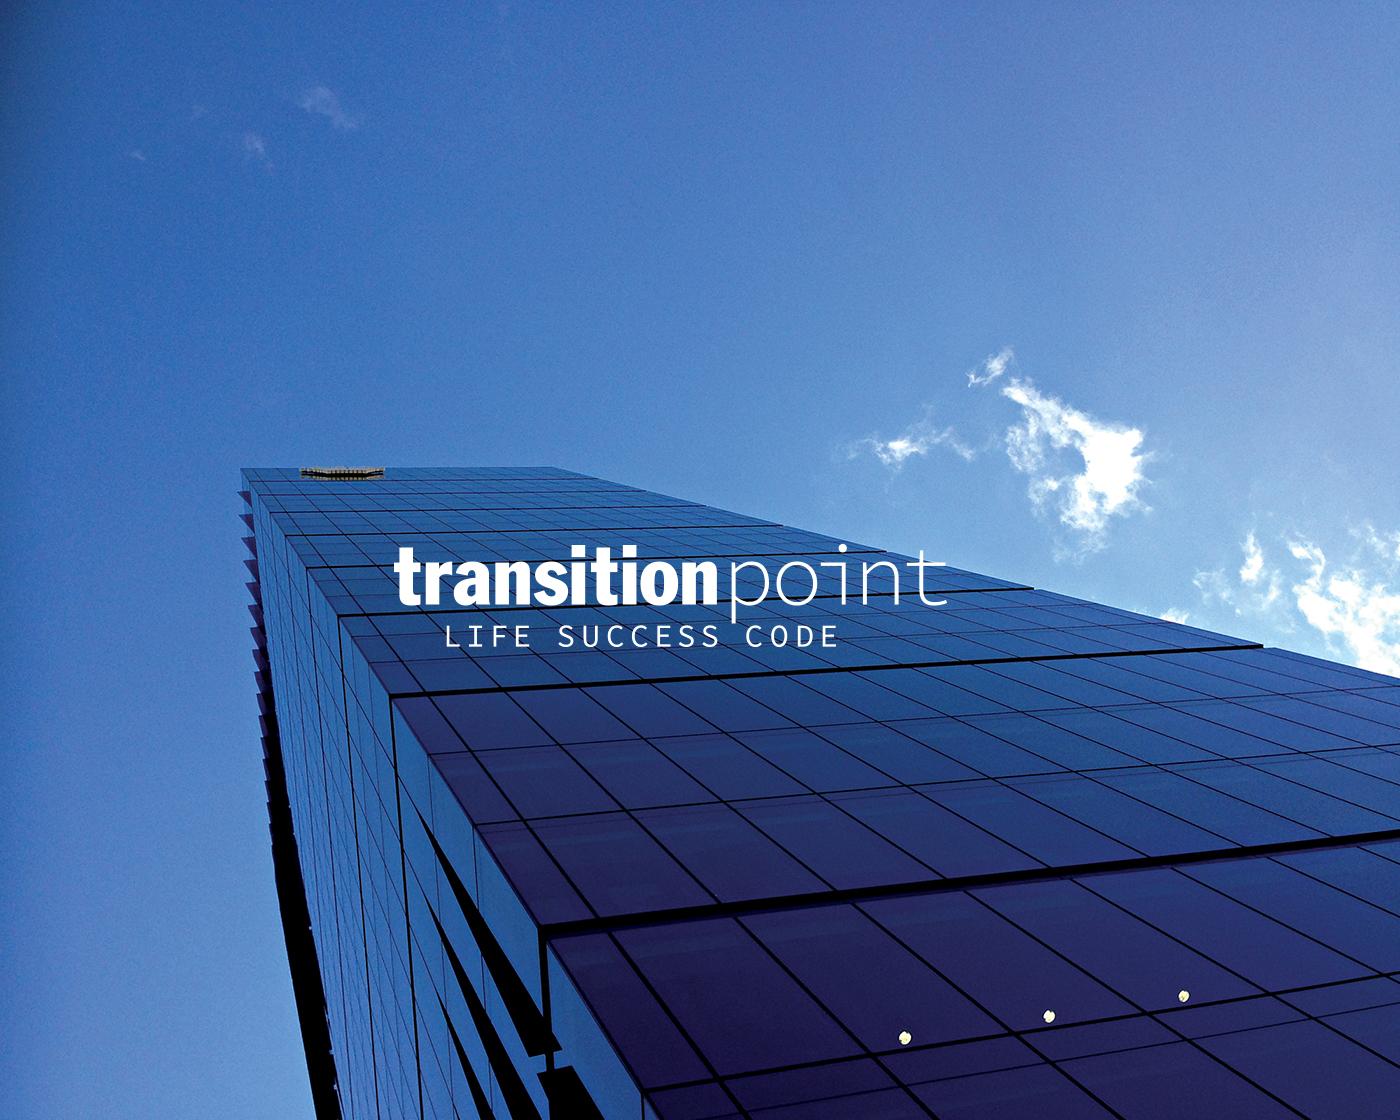 transition_point_tallbuilding_1400x1120_webo.jpg